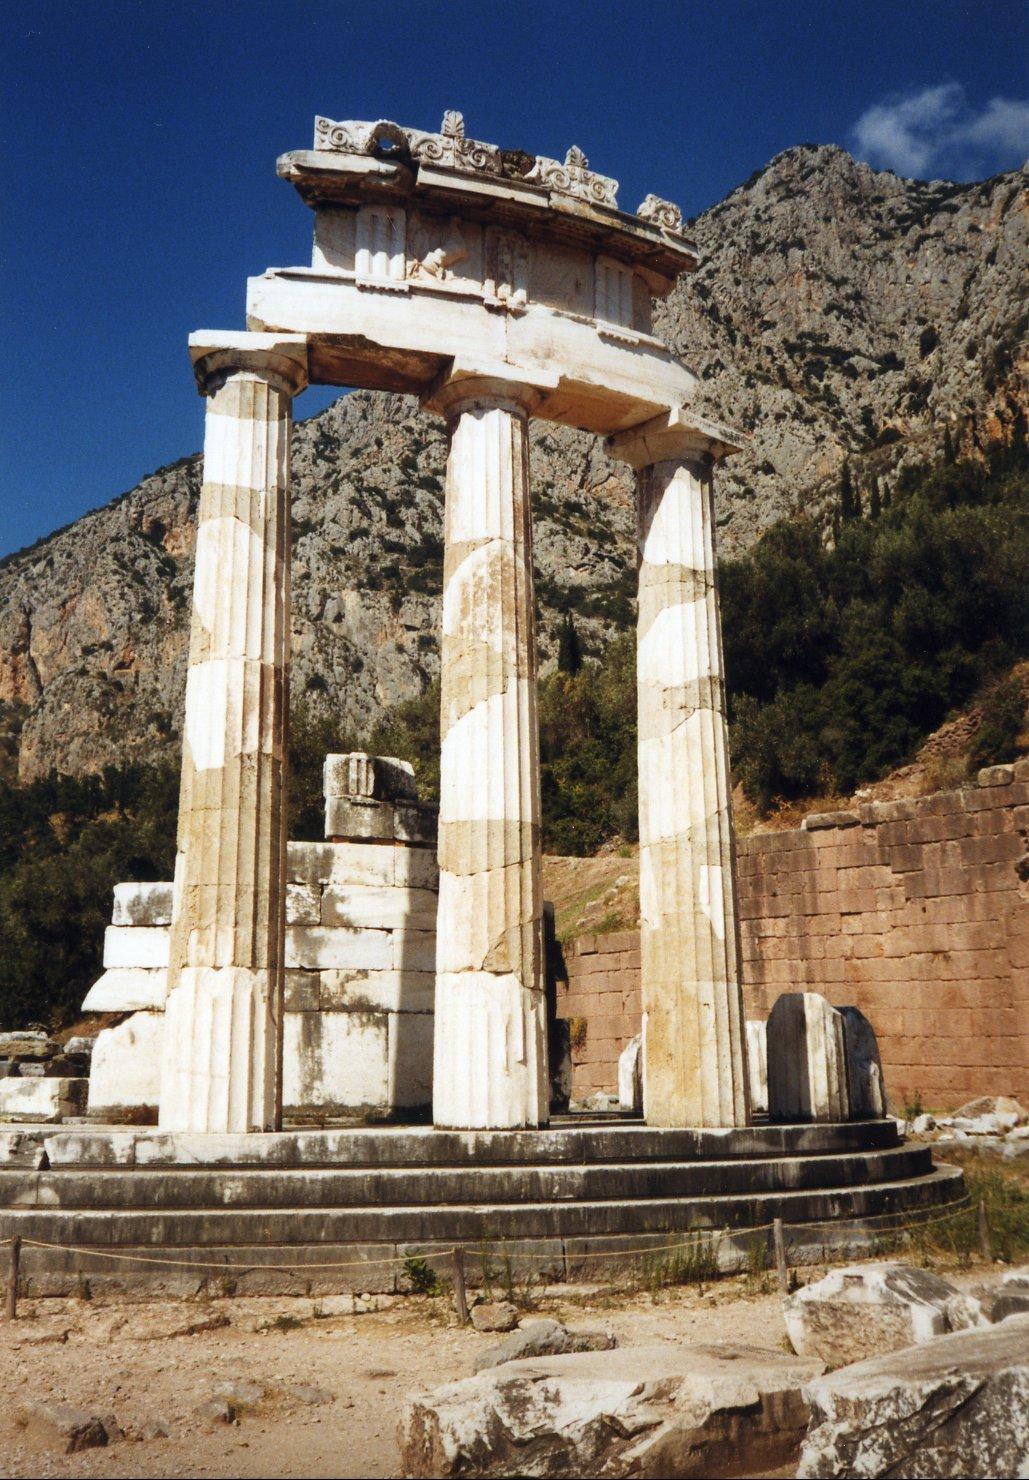 filegreece delphi tholosjpg wikimedia commons